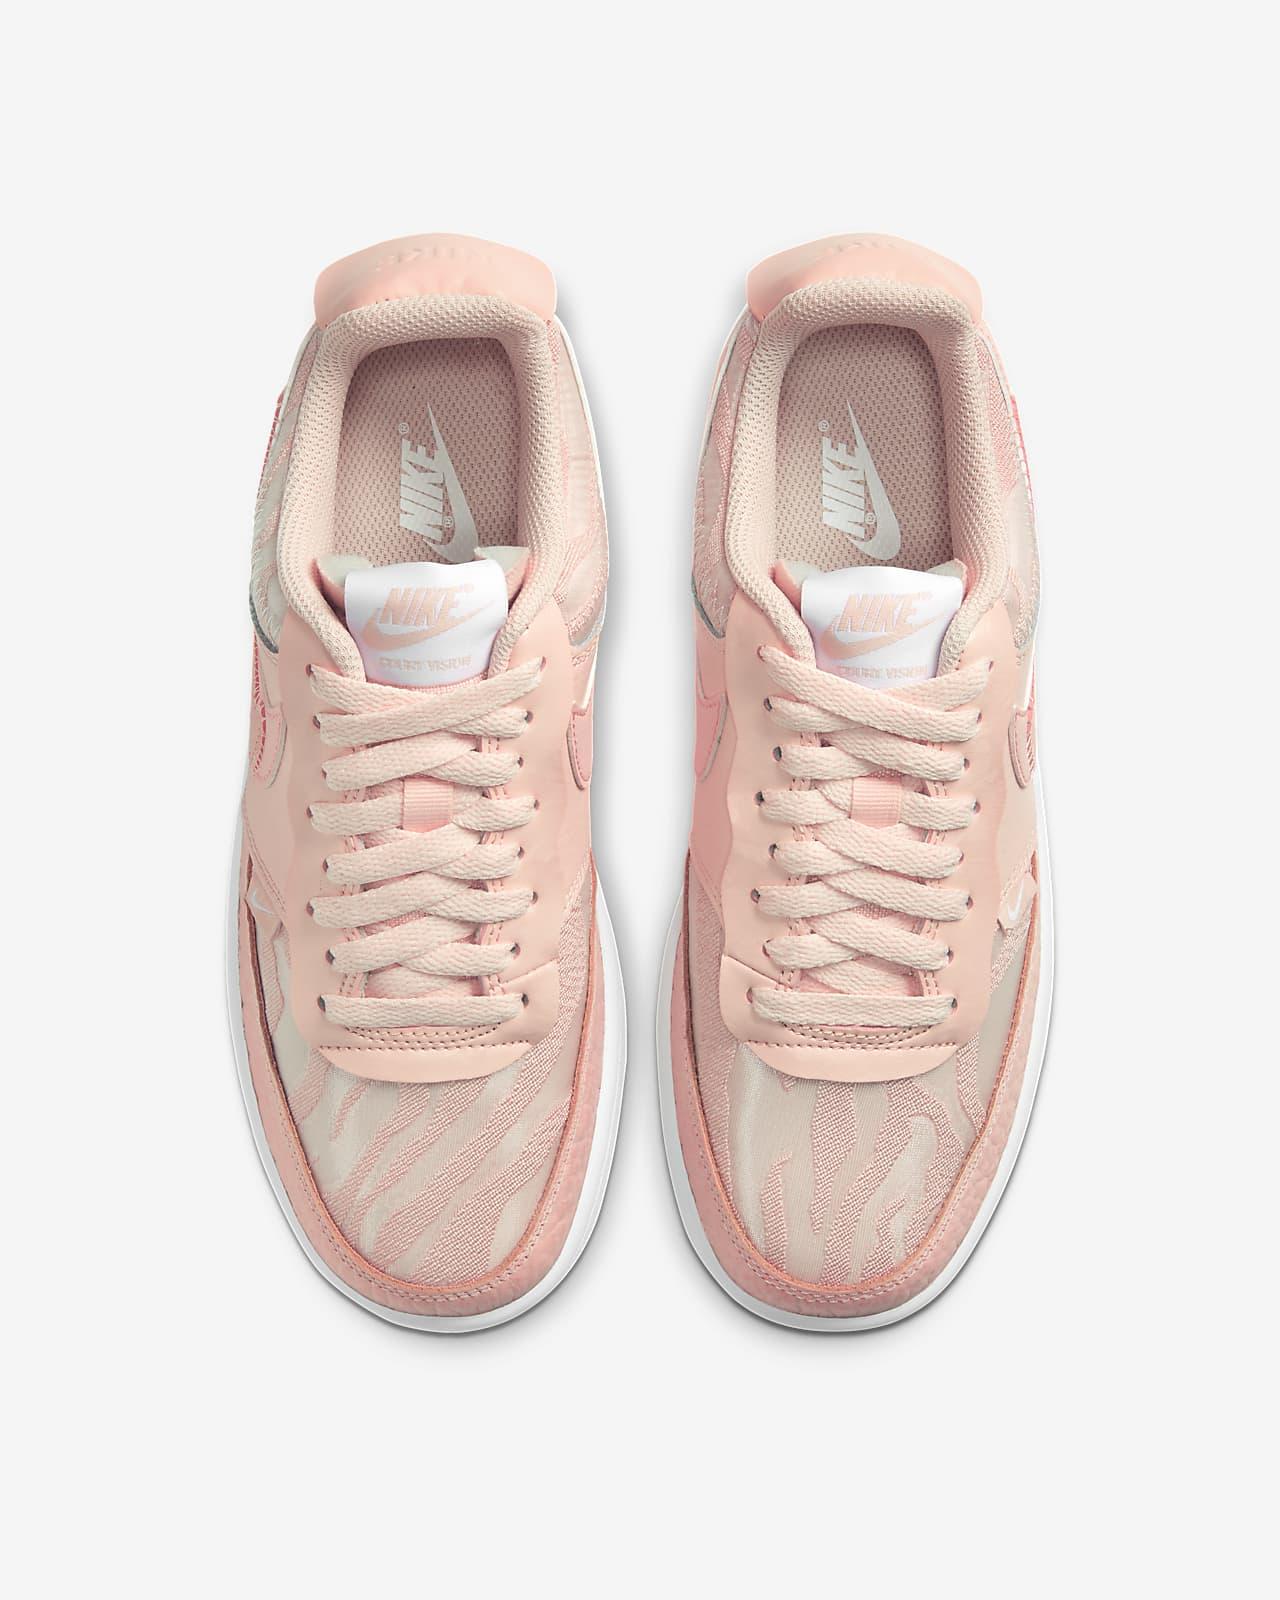 Nike Court Vision Low Premium Damenschuh